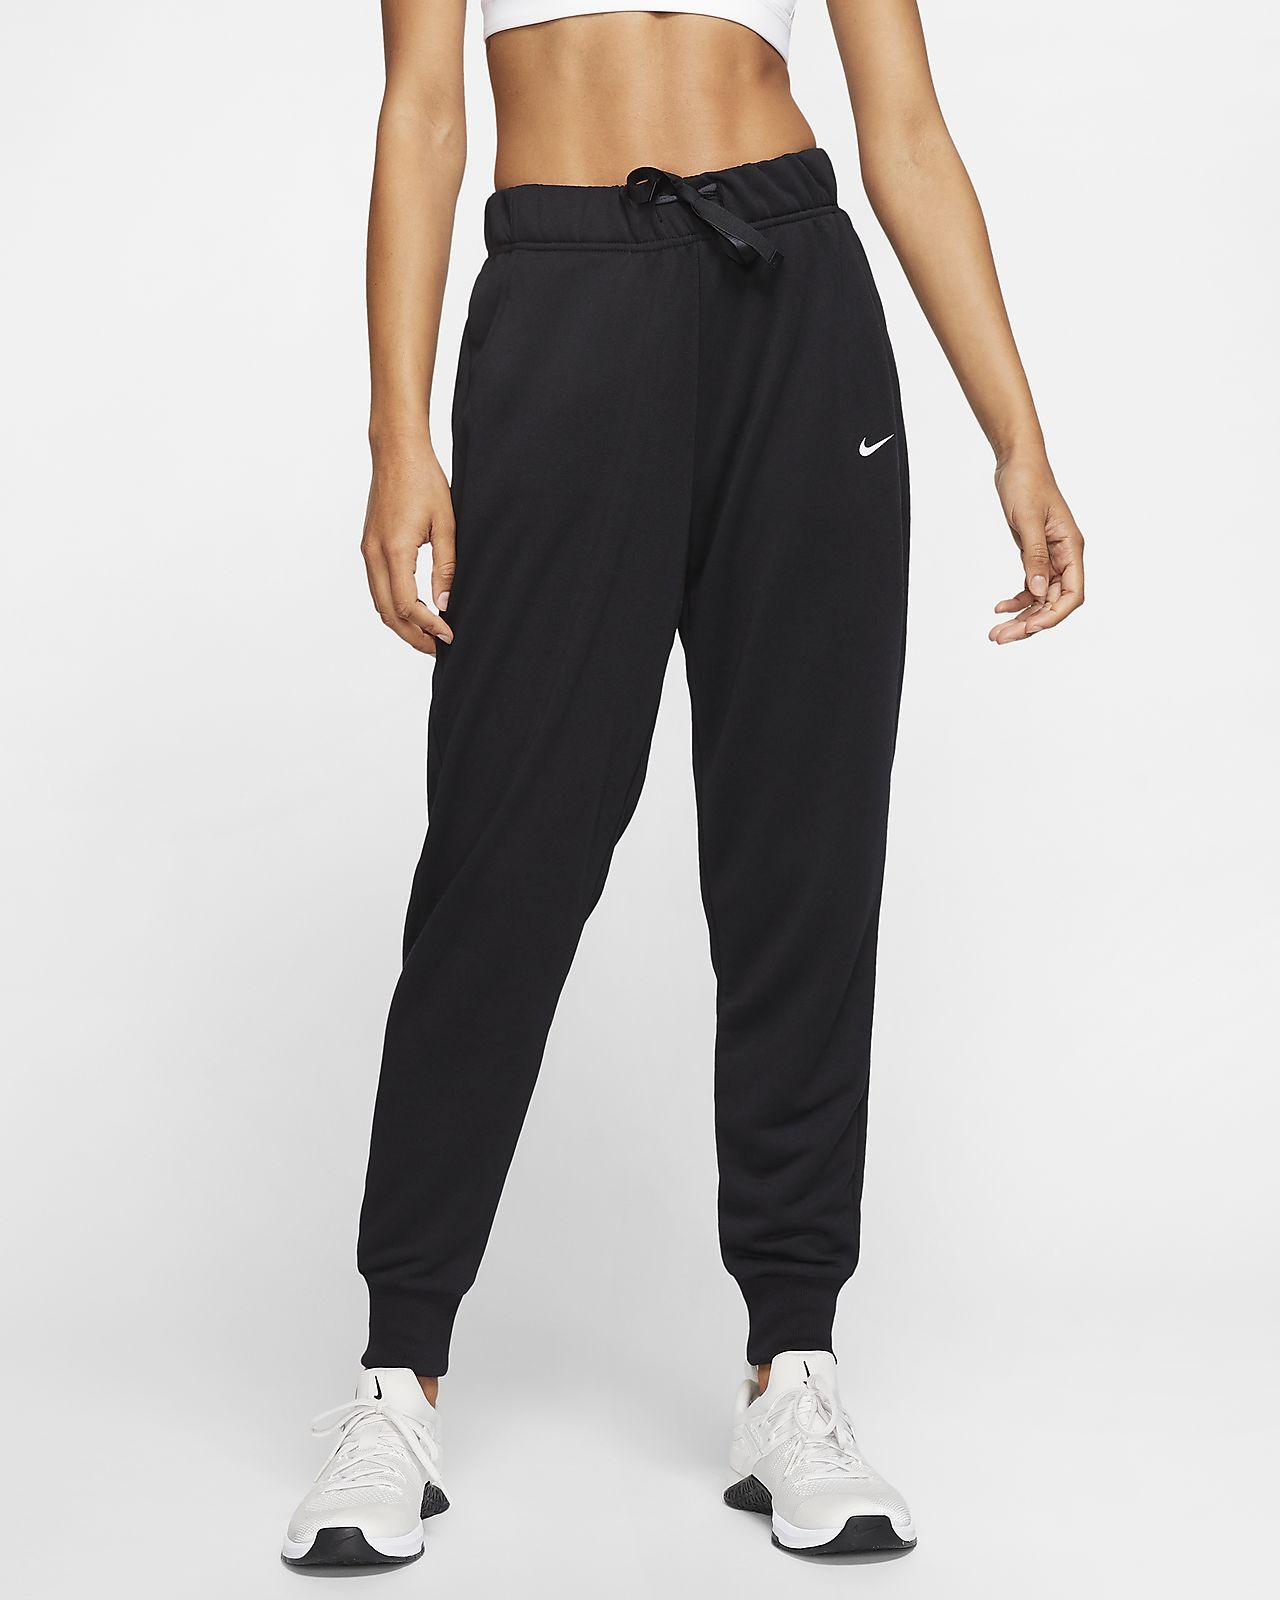 Nike Dri FIT Get Fit Trainingsbroek van fleece voor dames